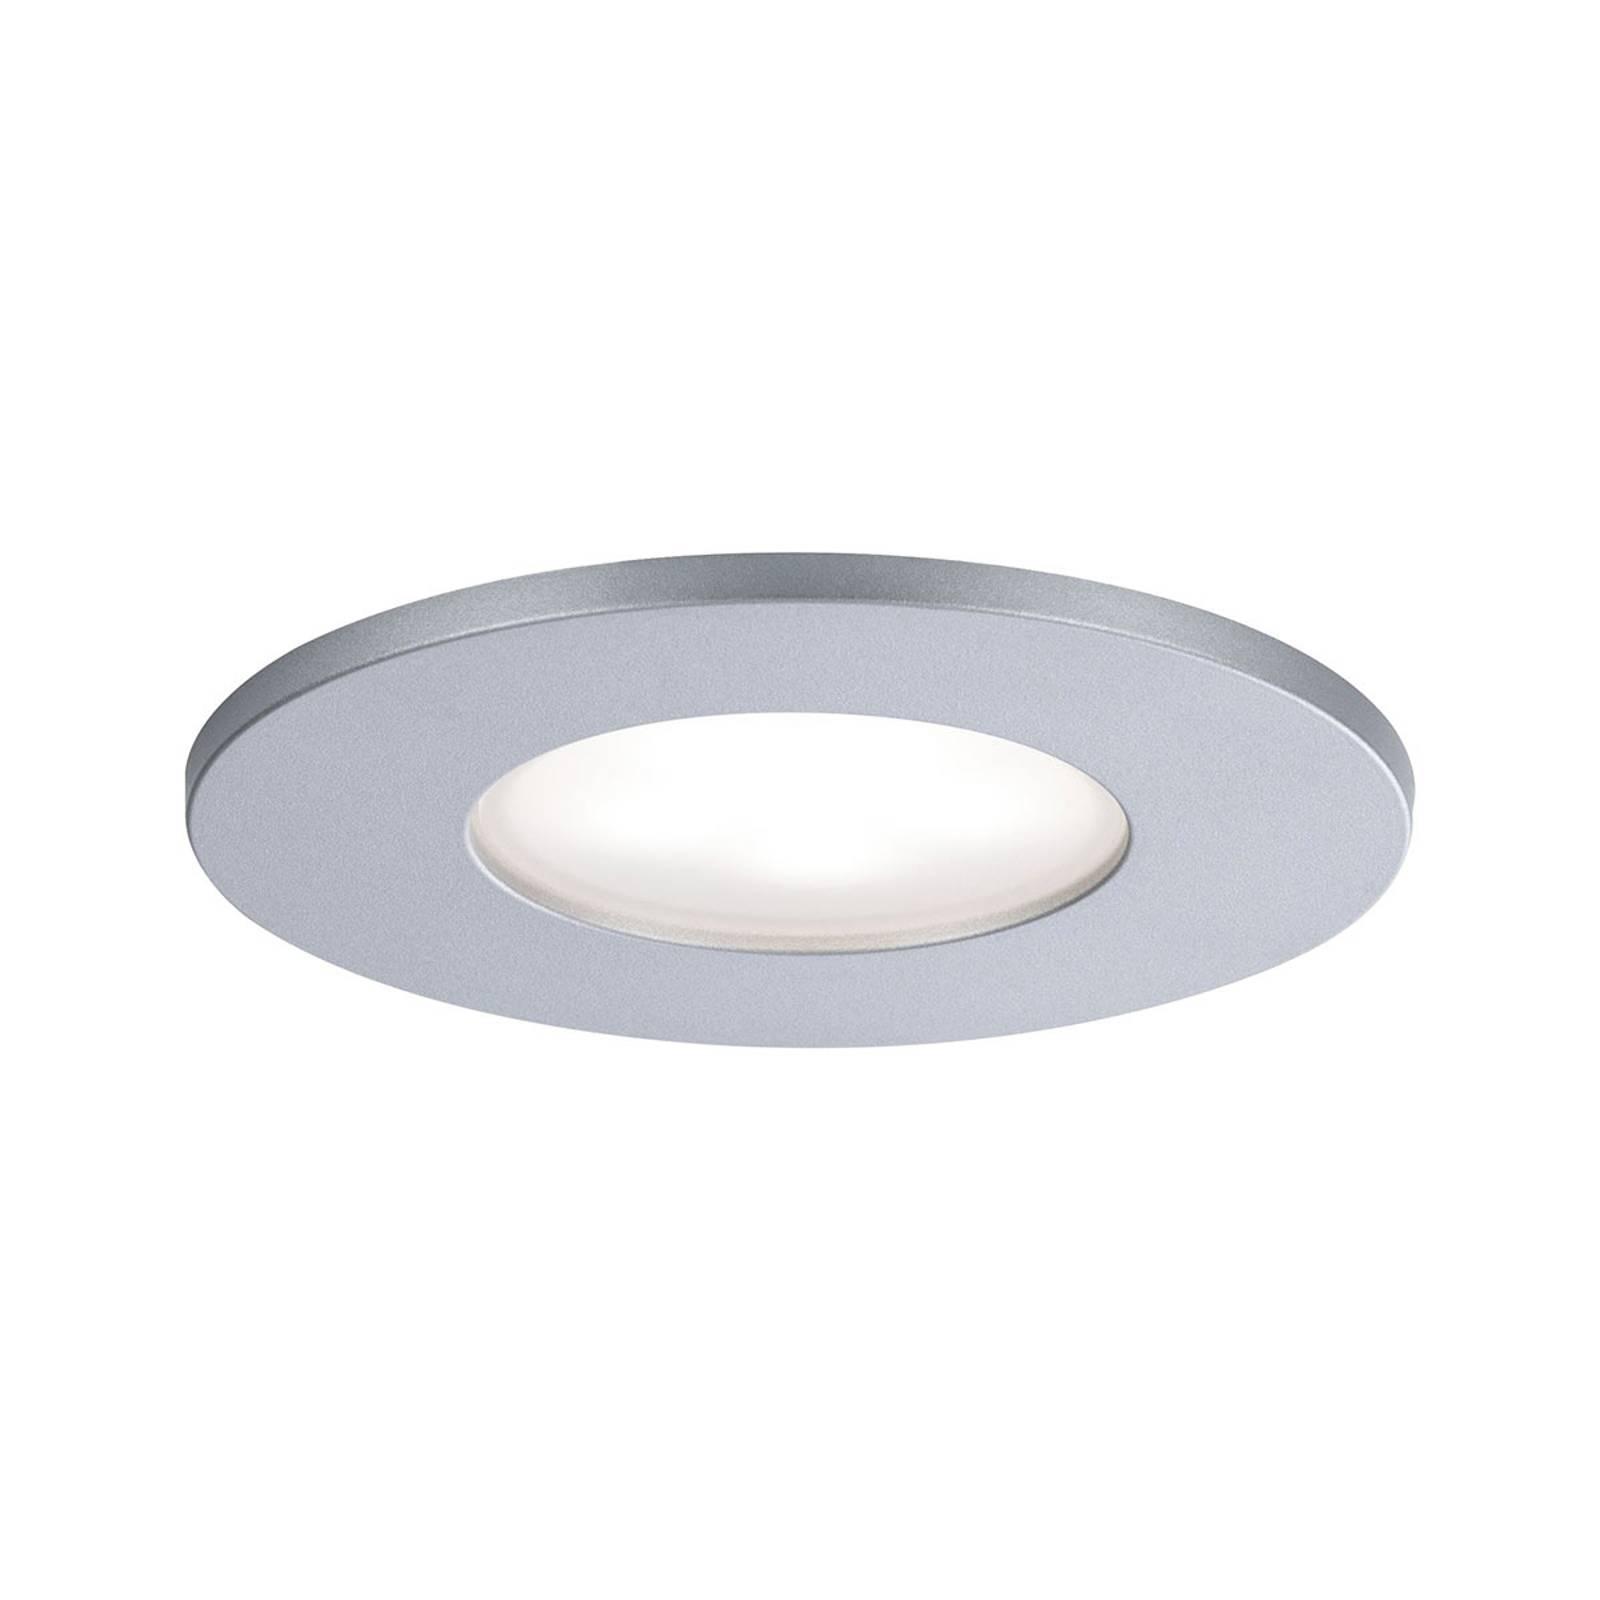 Paulmann LED buiten-inbouwspot Calla star chroom